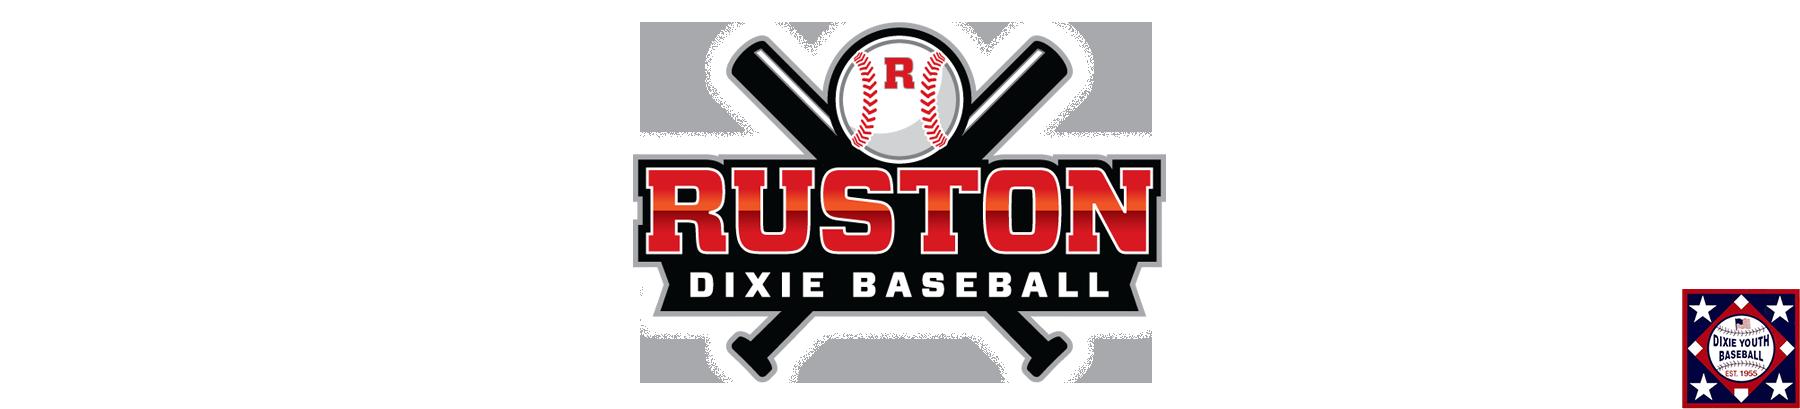 Ruston Dixie Baseball